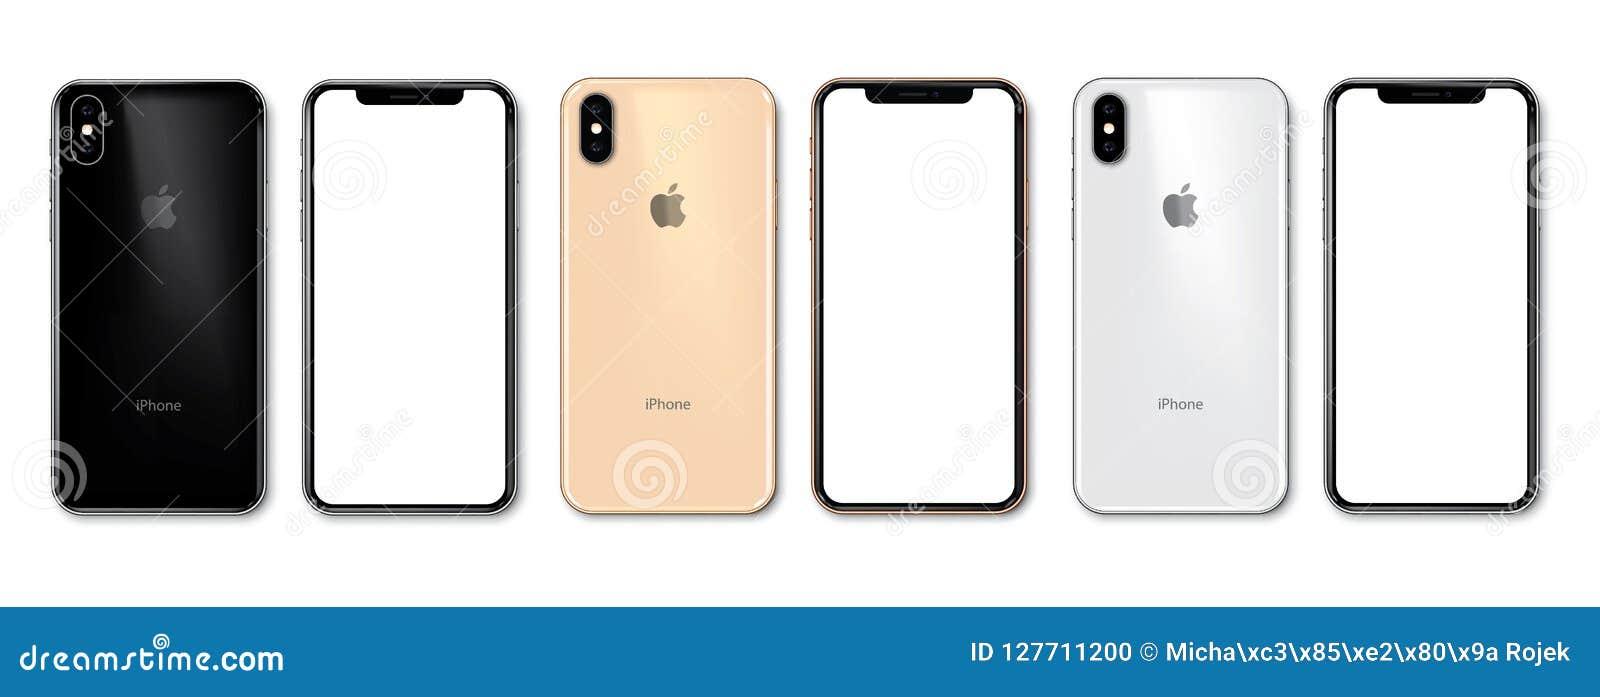 Nowy iPhone Xs w 3 kolorach